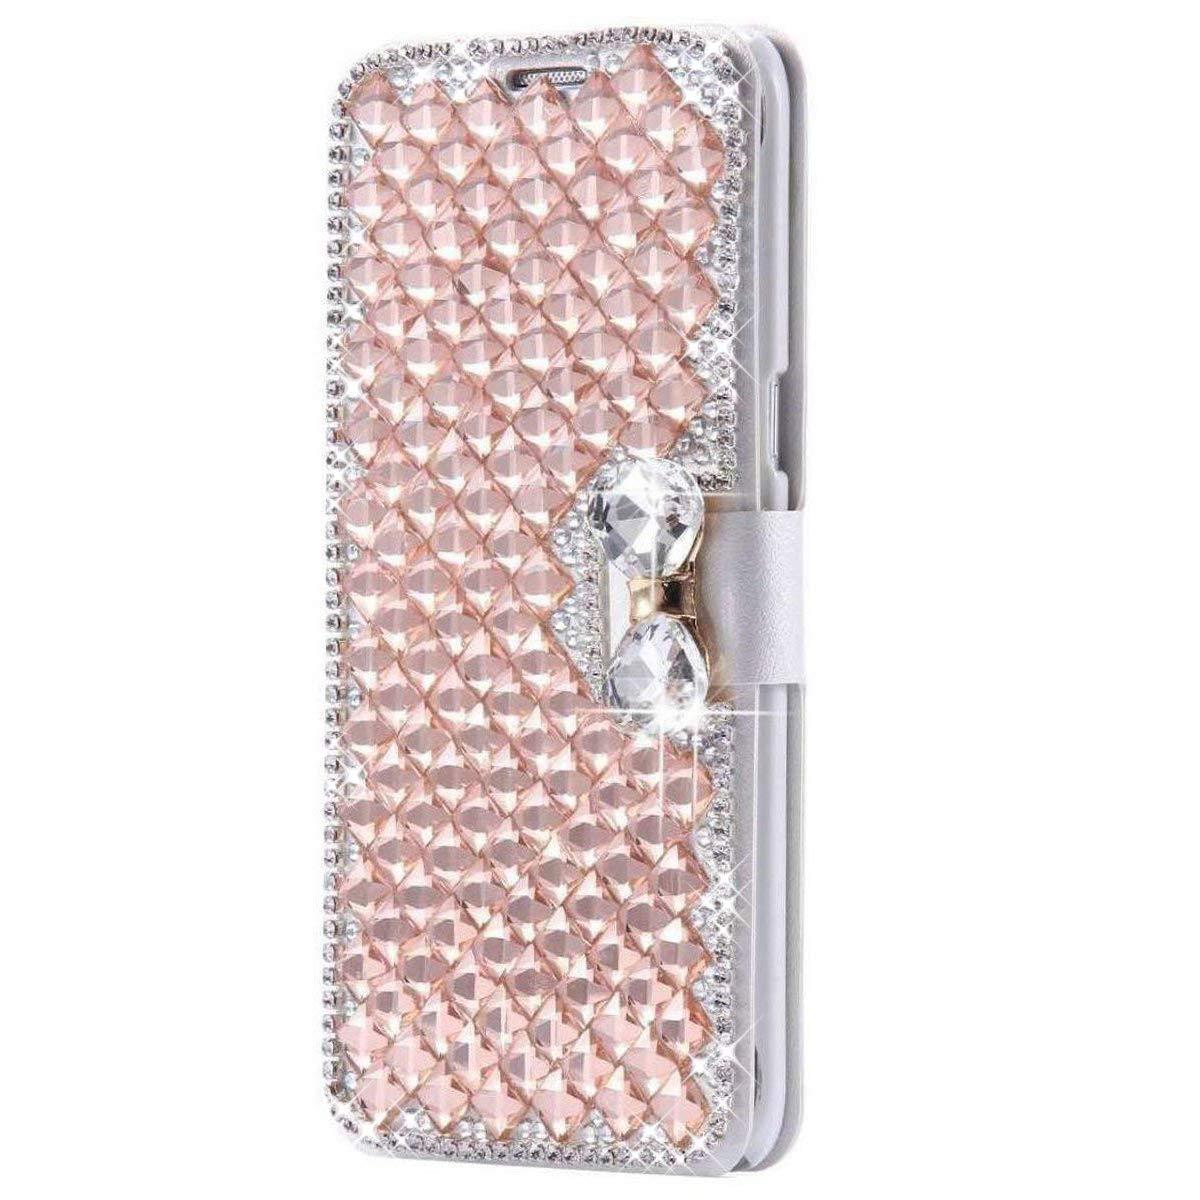 SainCat Kompatibel mit Samsung Galaxy Note 3 H/ülle Schmetterling Leder Flip Case Glitzer Strass Ultra D/ünn Sch/ützh/ülle Sto/ßfest Handyh/ülle Weicher Bookstyle PU Ledertasche-Himmelblau